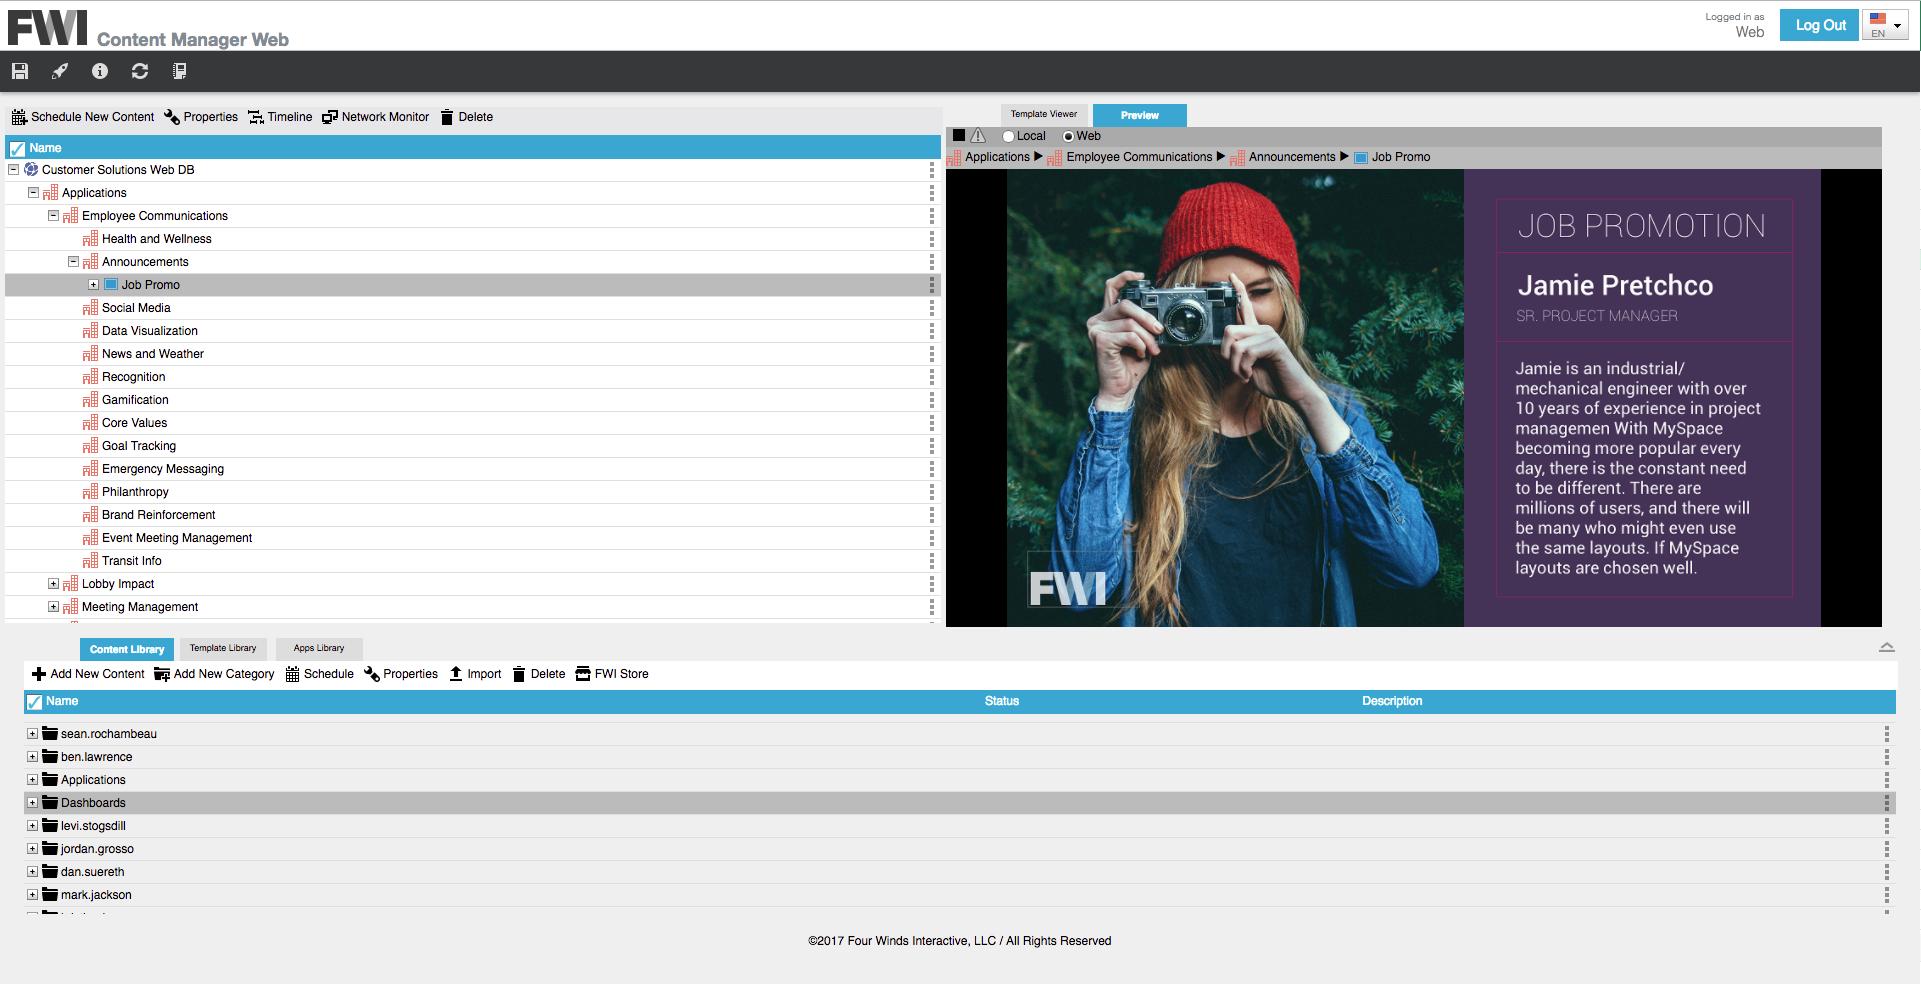 FWI content management